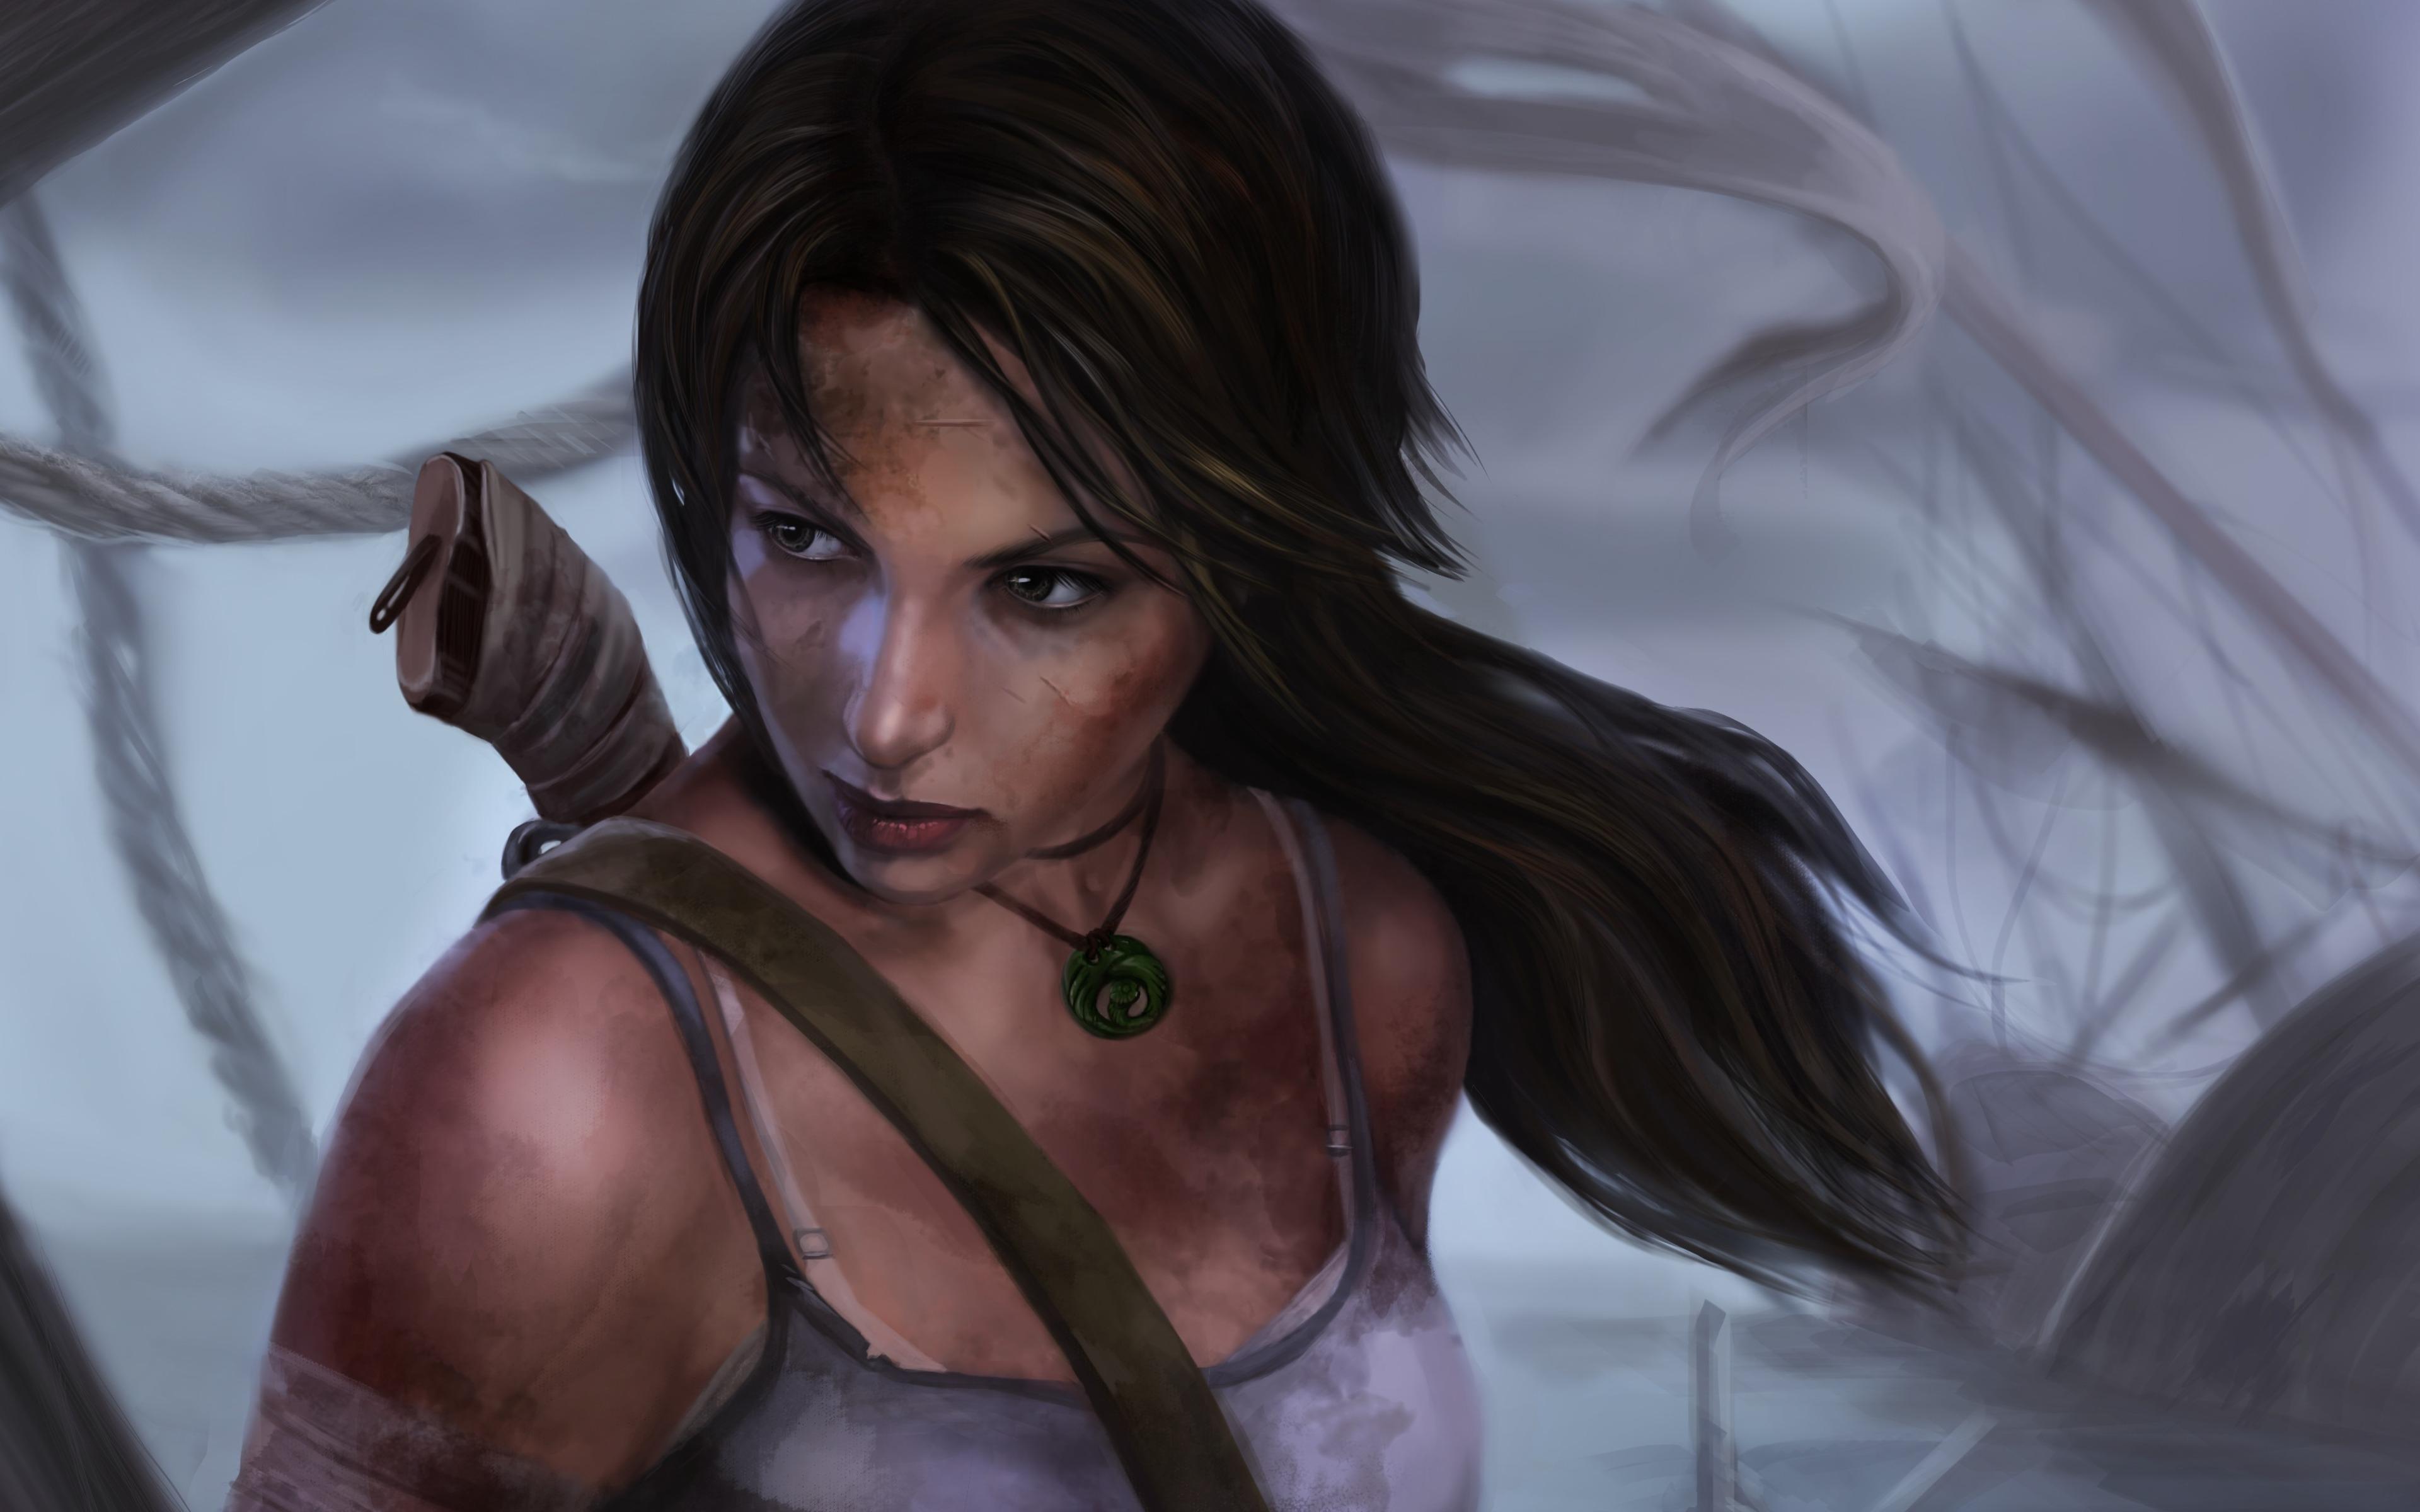 lara-croft-tomb-raider-art-girl-4t.jpg